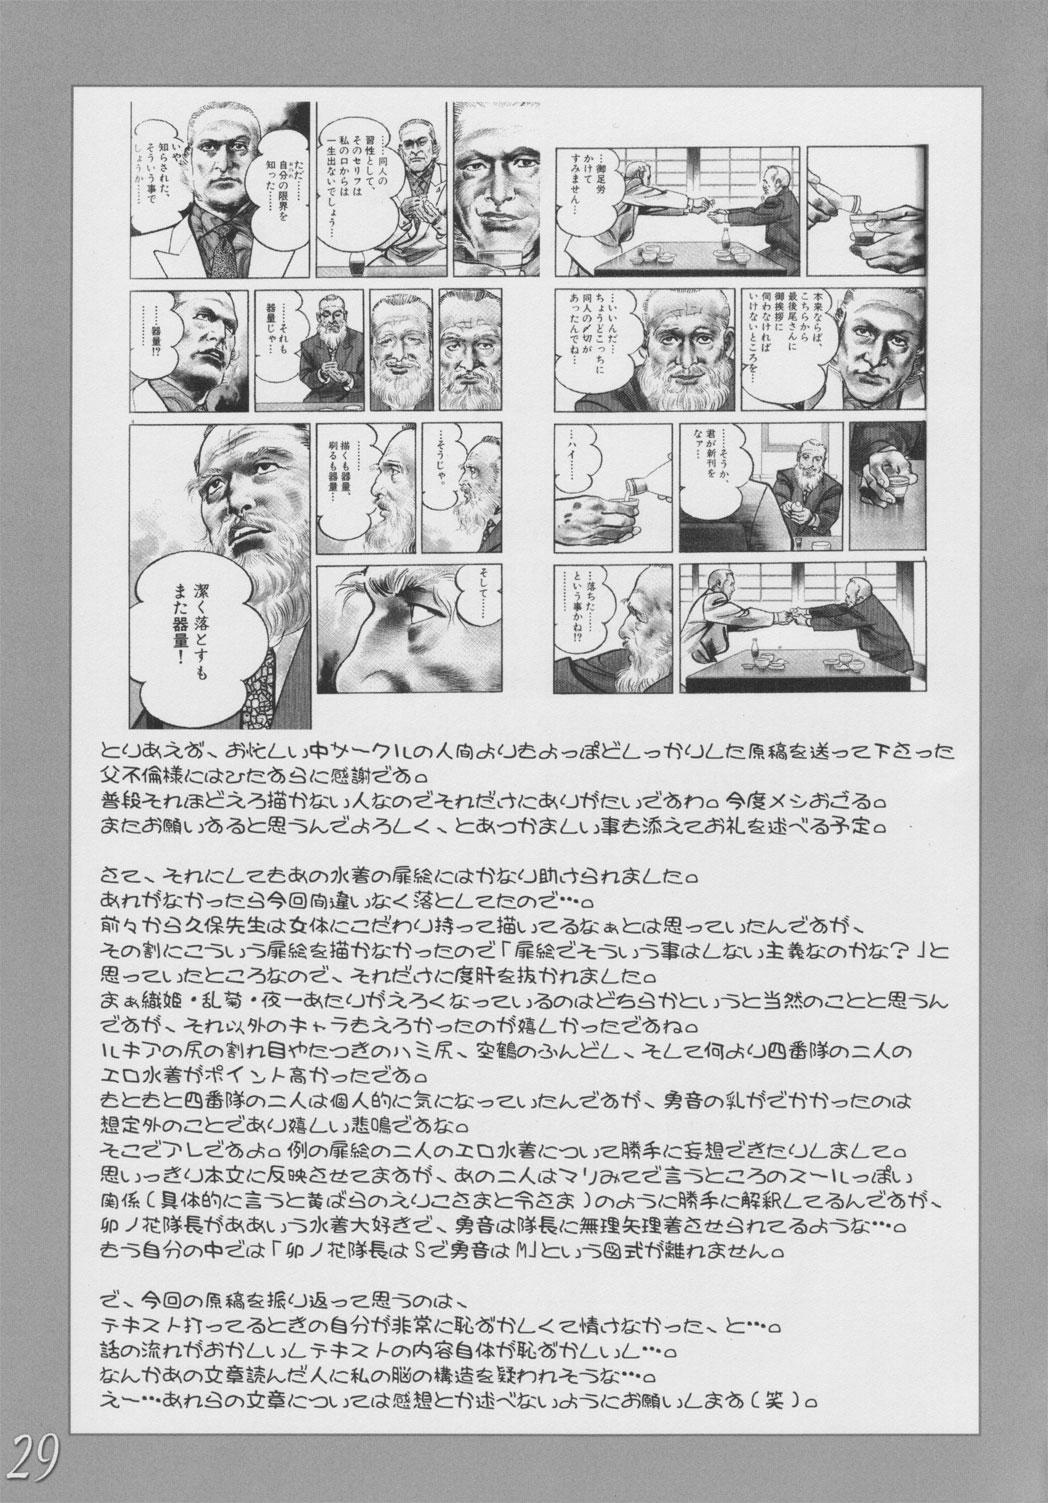 (ComiComi8) [HIGHWAY-SENMU (Maban, Saikoubi)] H-Sen vol. 8 -Erotical noma noma iei!!- (BLEACH) 27